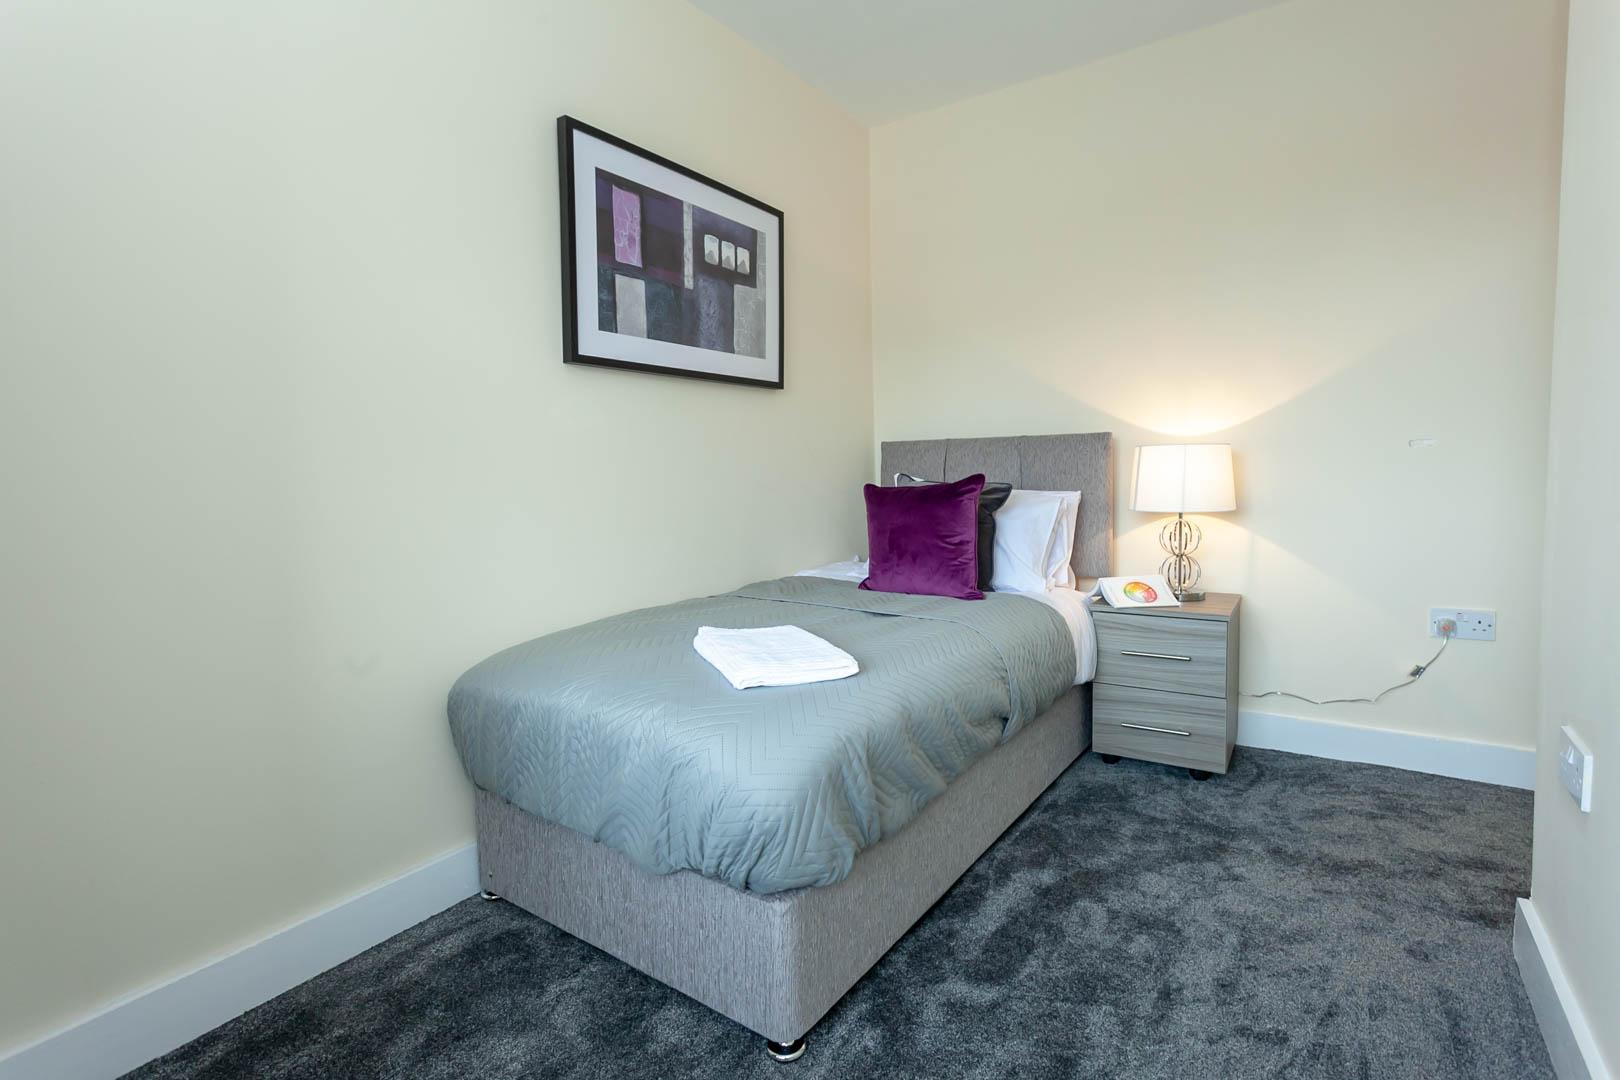 Single bed at St Marys House, Latchford, Warrington